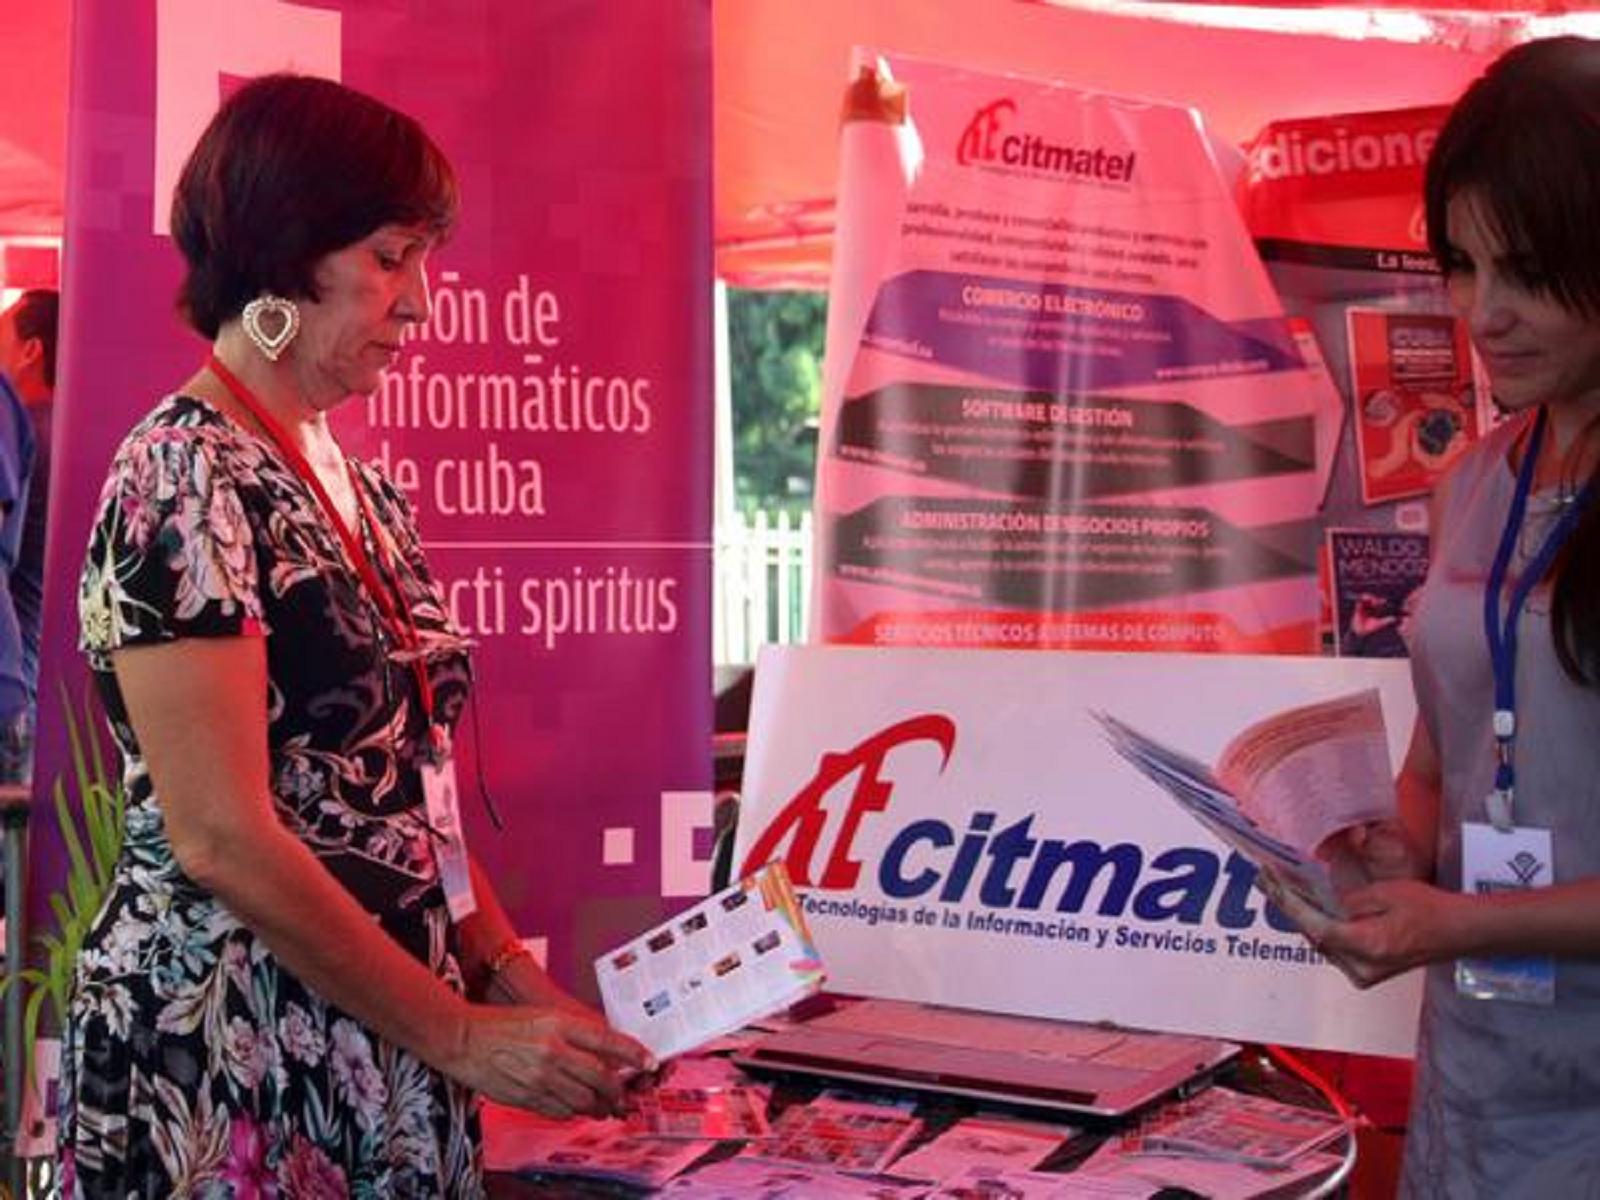 Múltiples opciones en la Feria Tecnológica La Guayabera 5.0